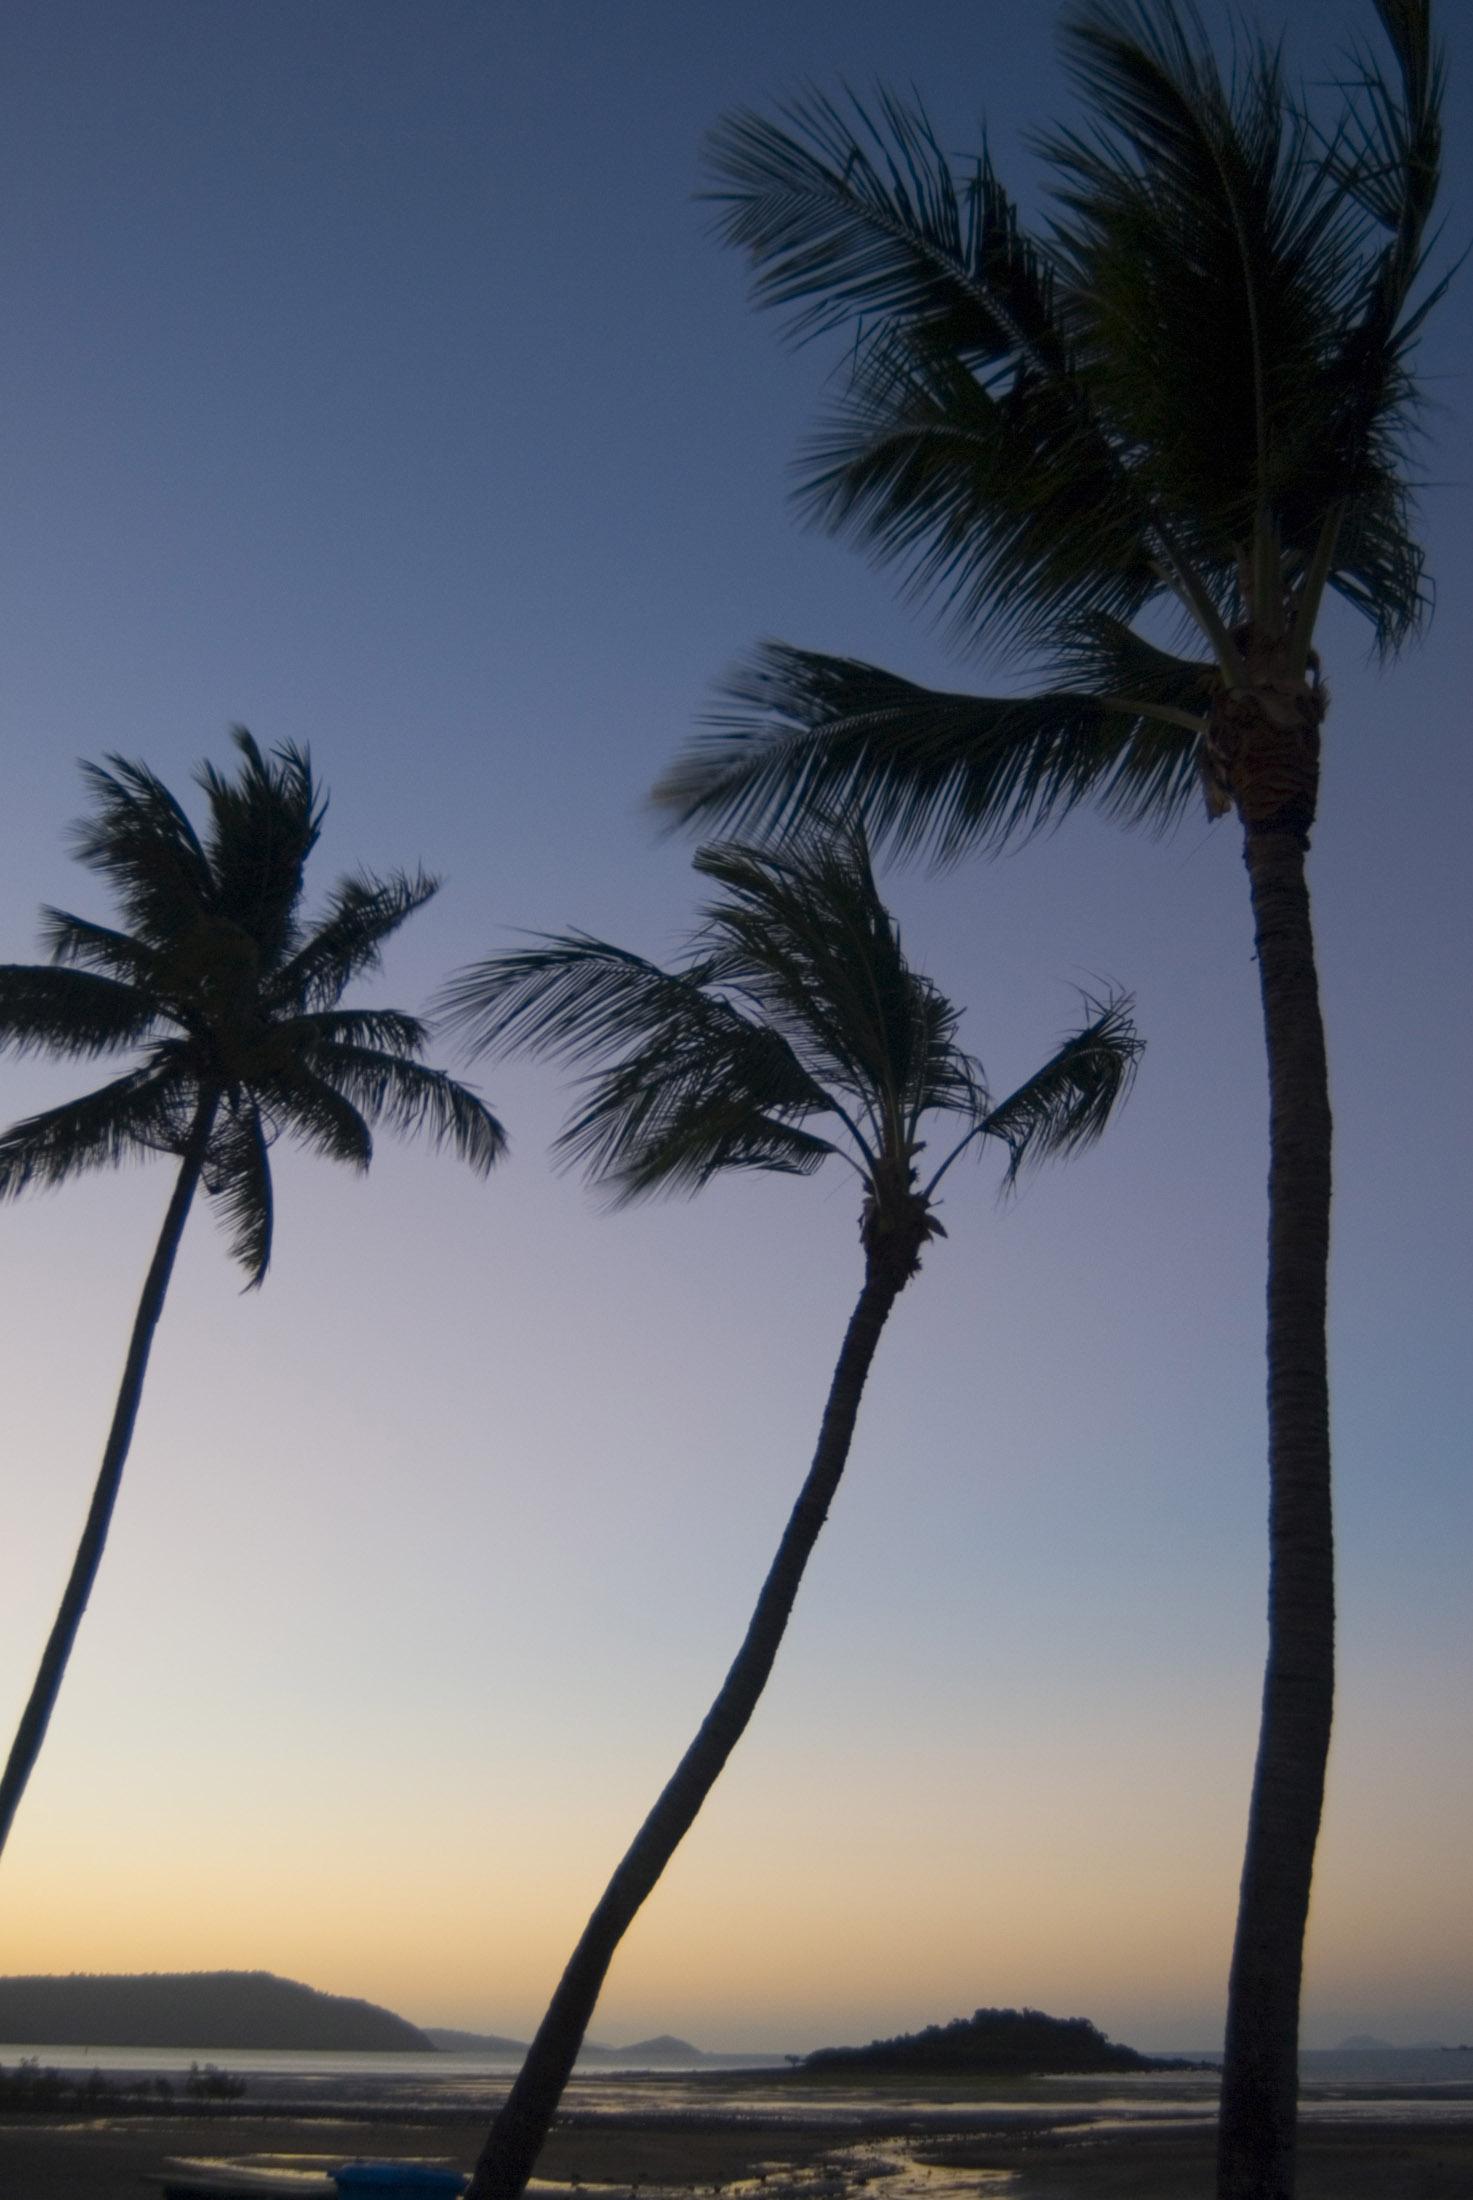 tropical sunset palm tree - photo #27